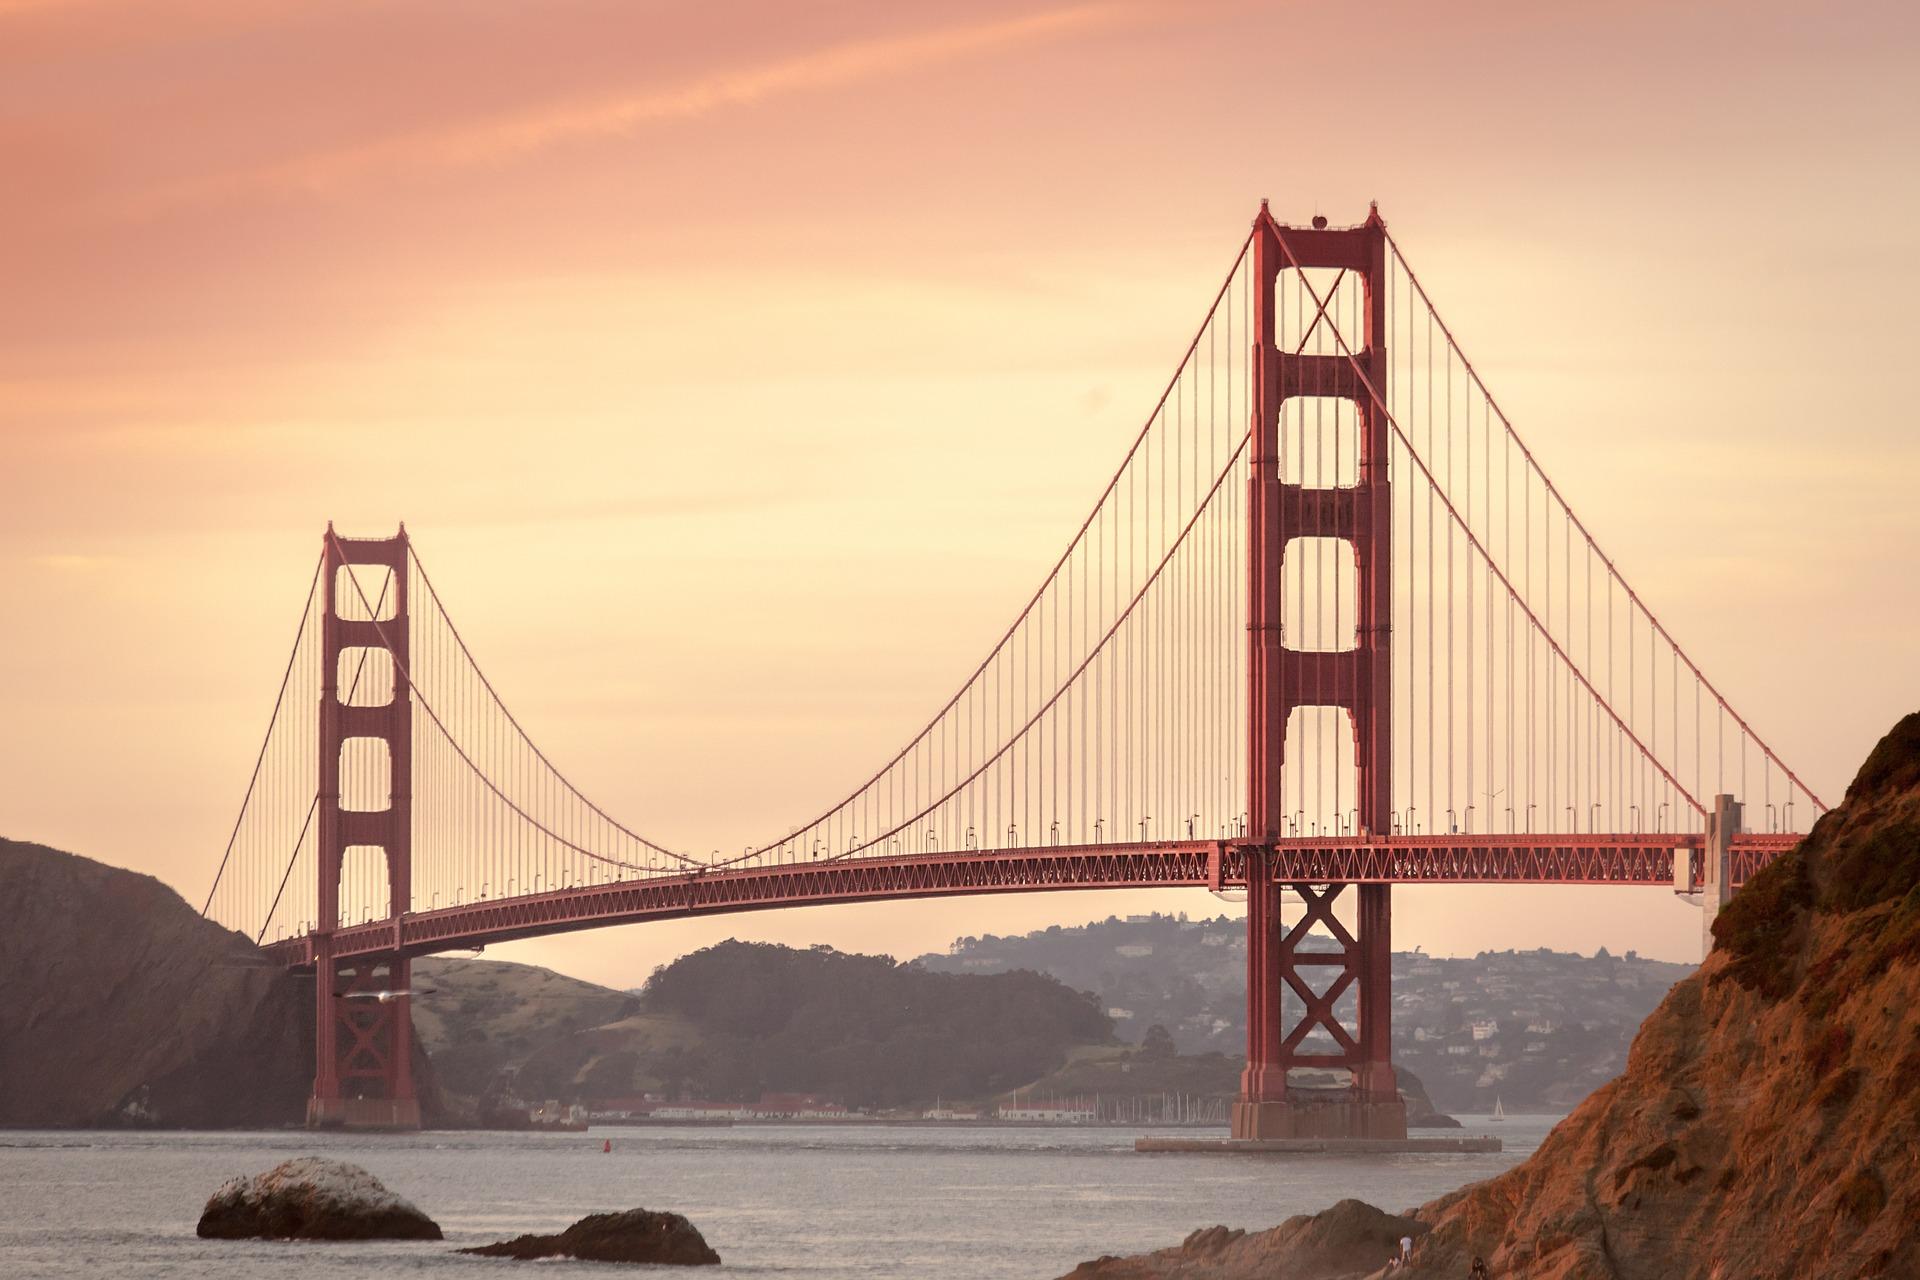 The Best App to Tour San Francisco